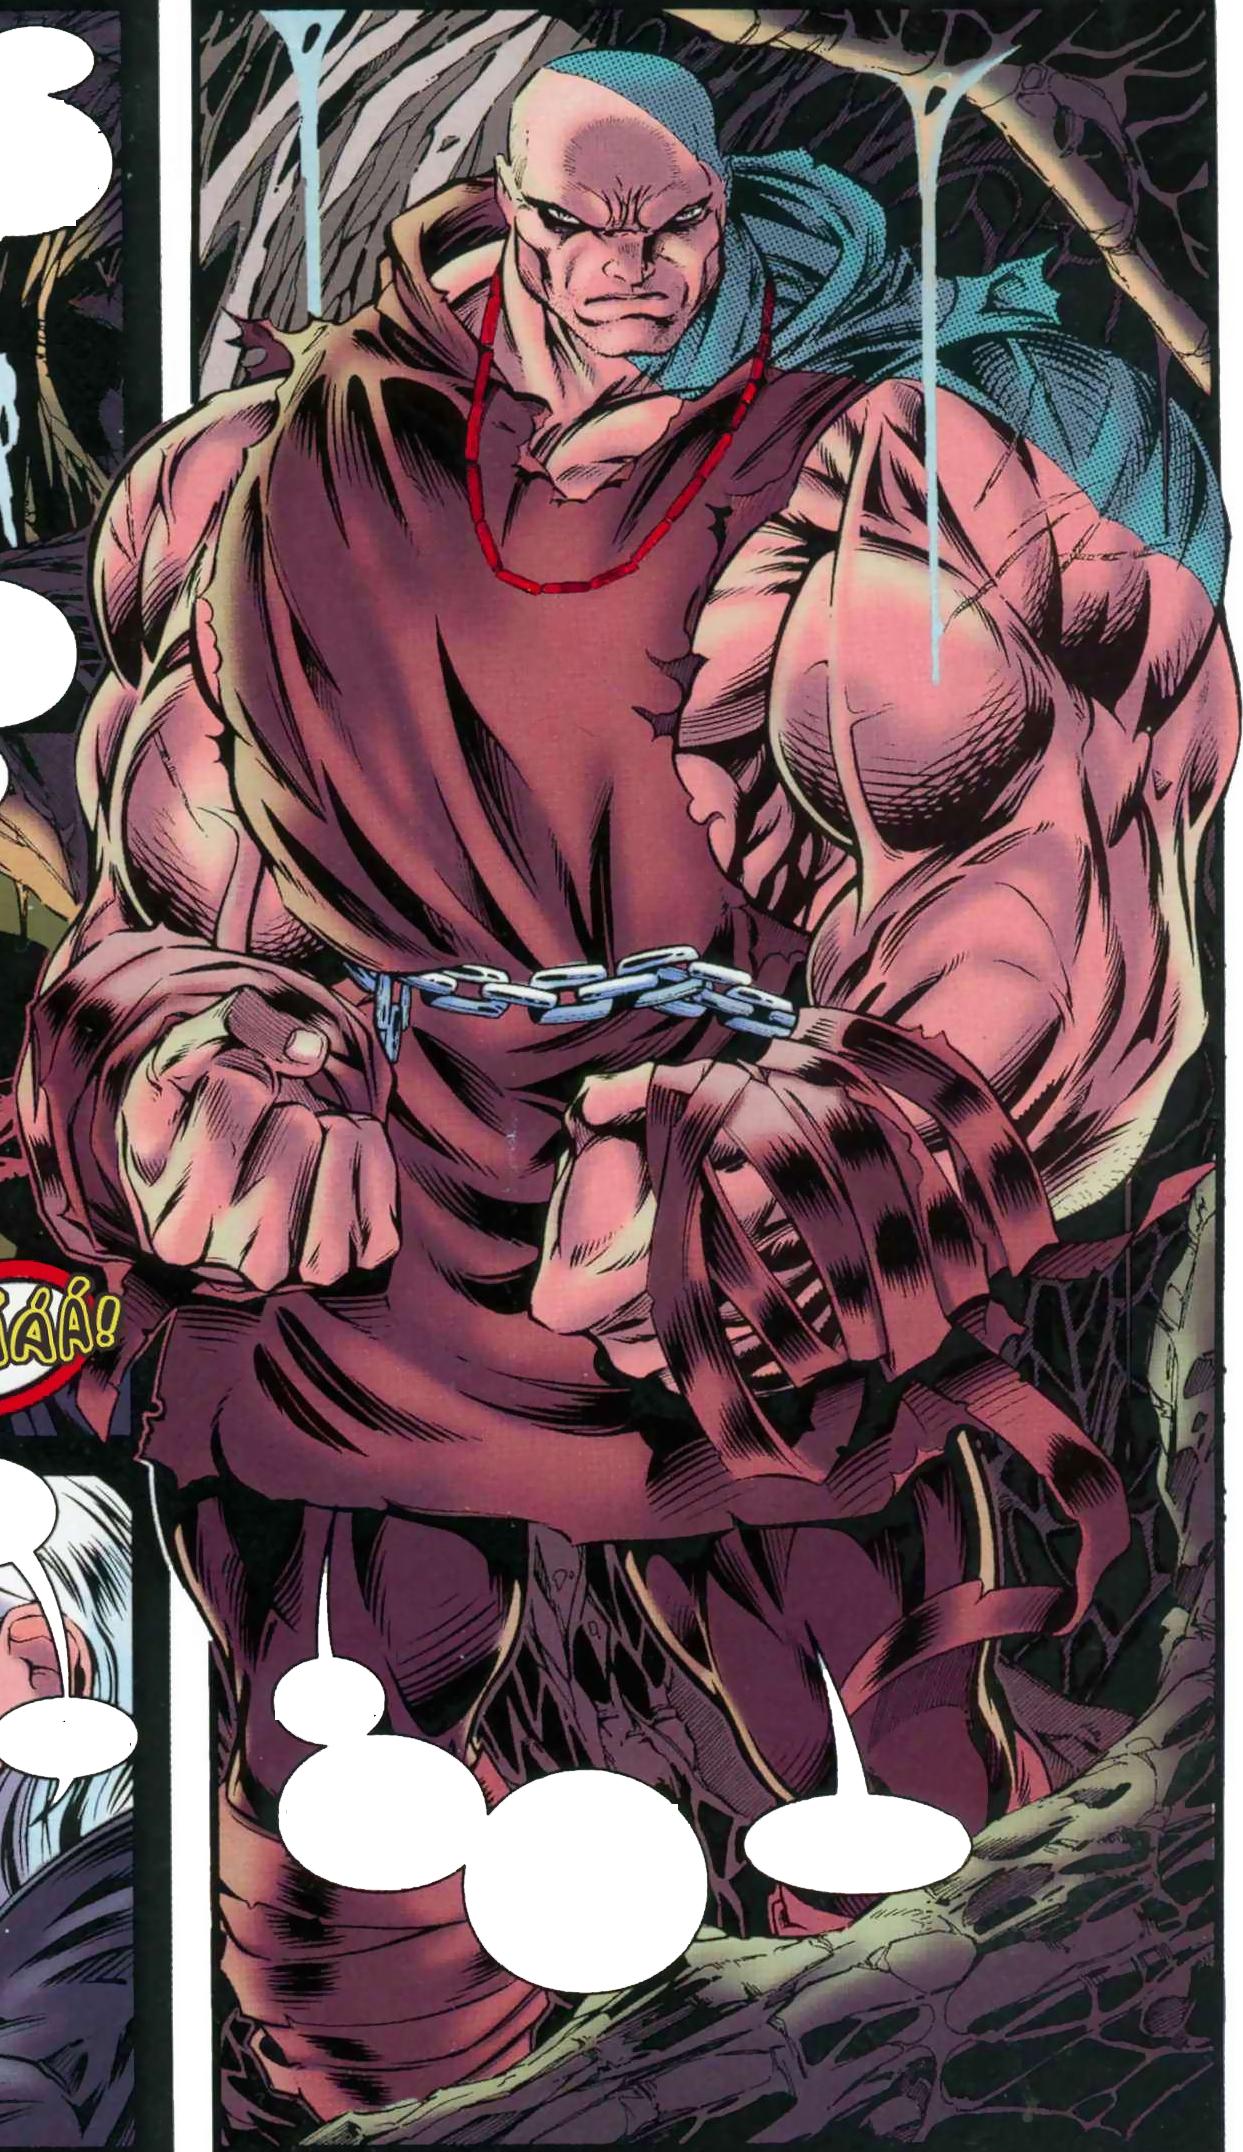 Best Wallpaper Marvel Juggernaut - -Earth-295-Juggernaut-Cain-Marko-juggernaut-36830247-1243-2152  Picture_964386.jpg